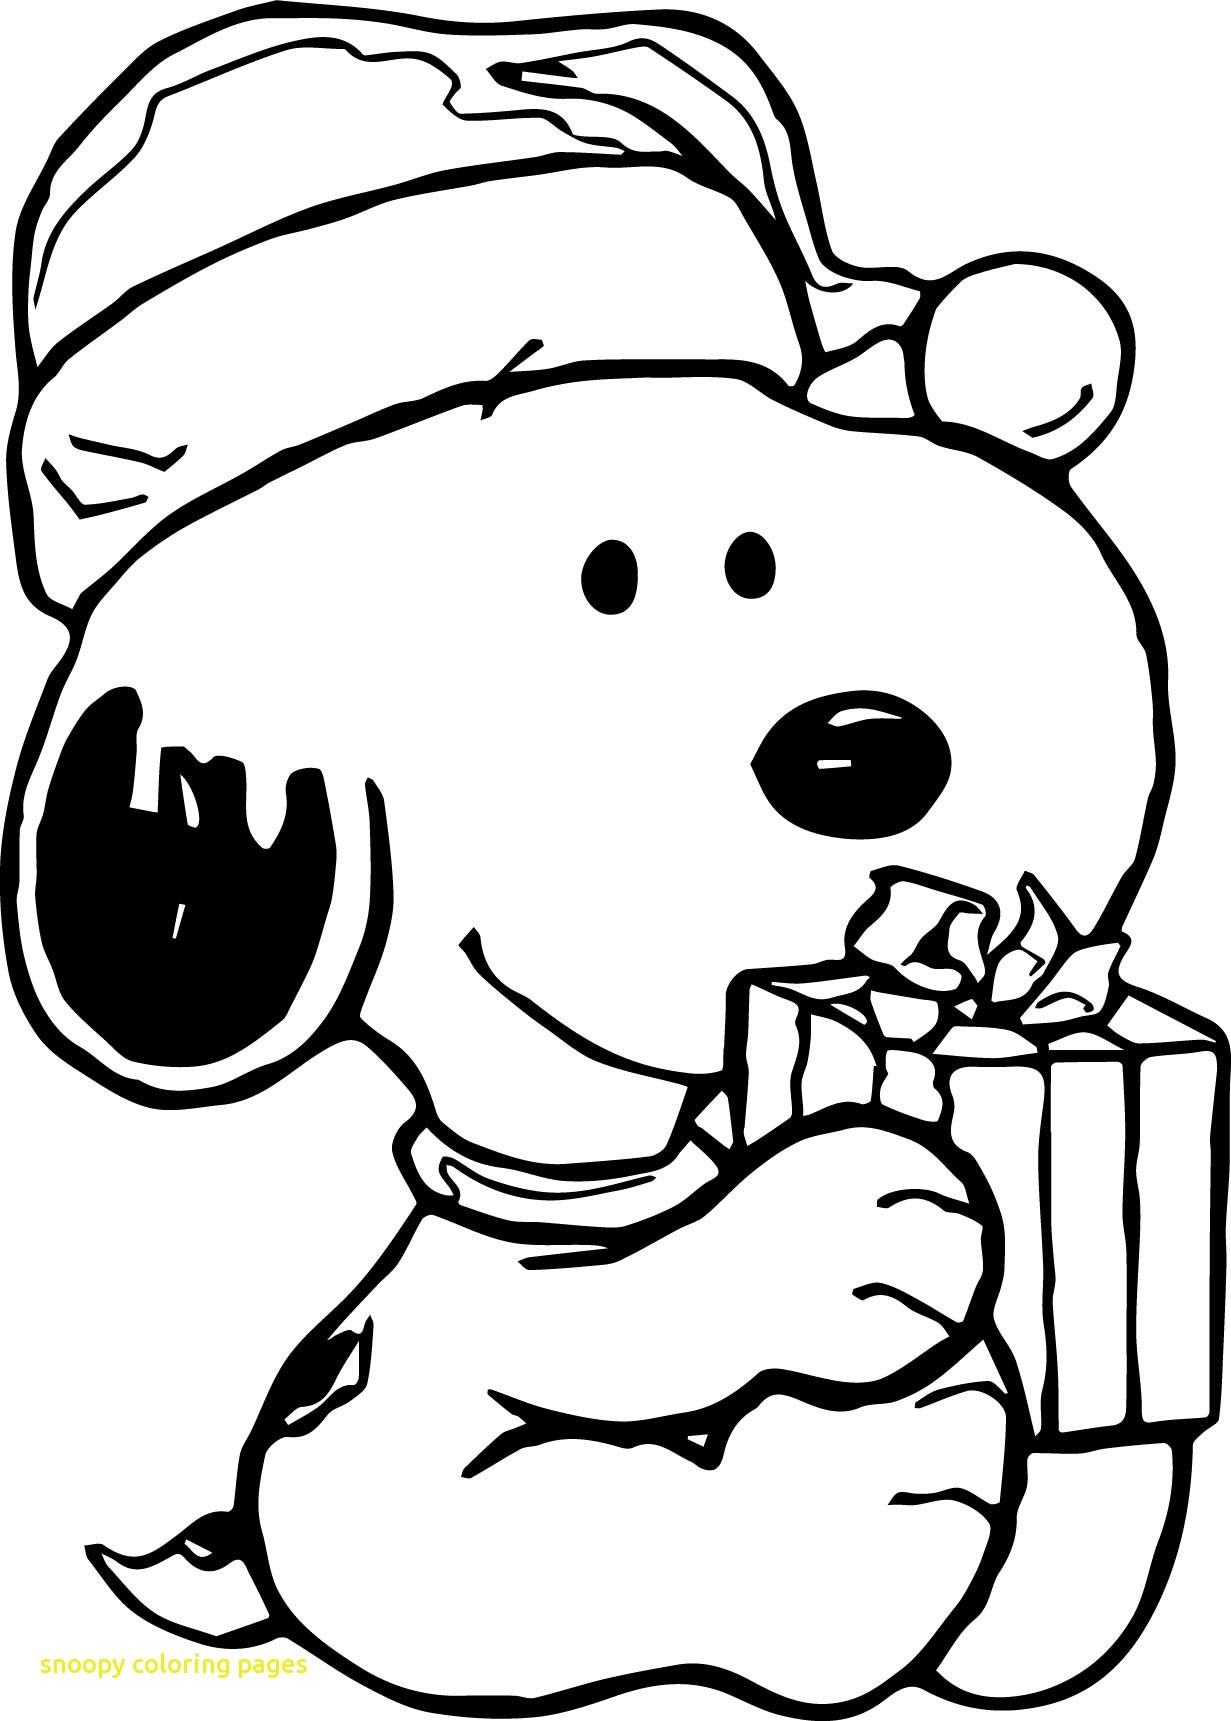 1231x1721 Snoopy Christmas Drawing Halloween Holidays Wizard